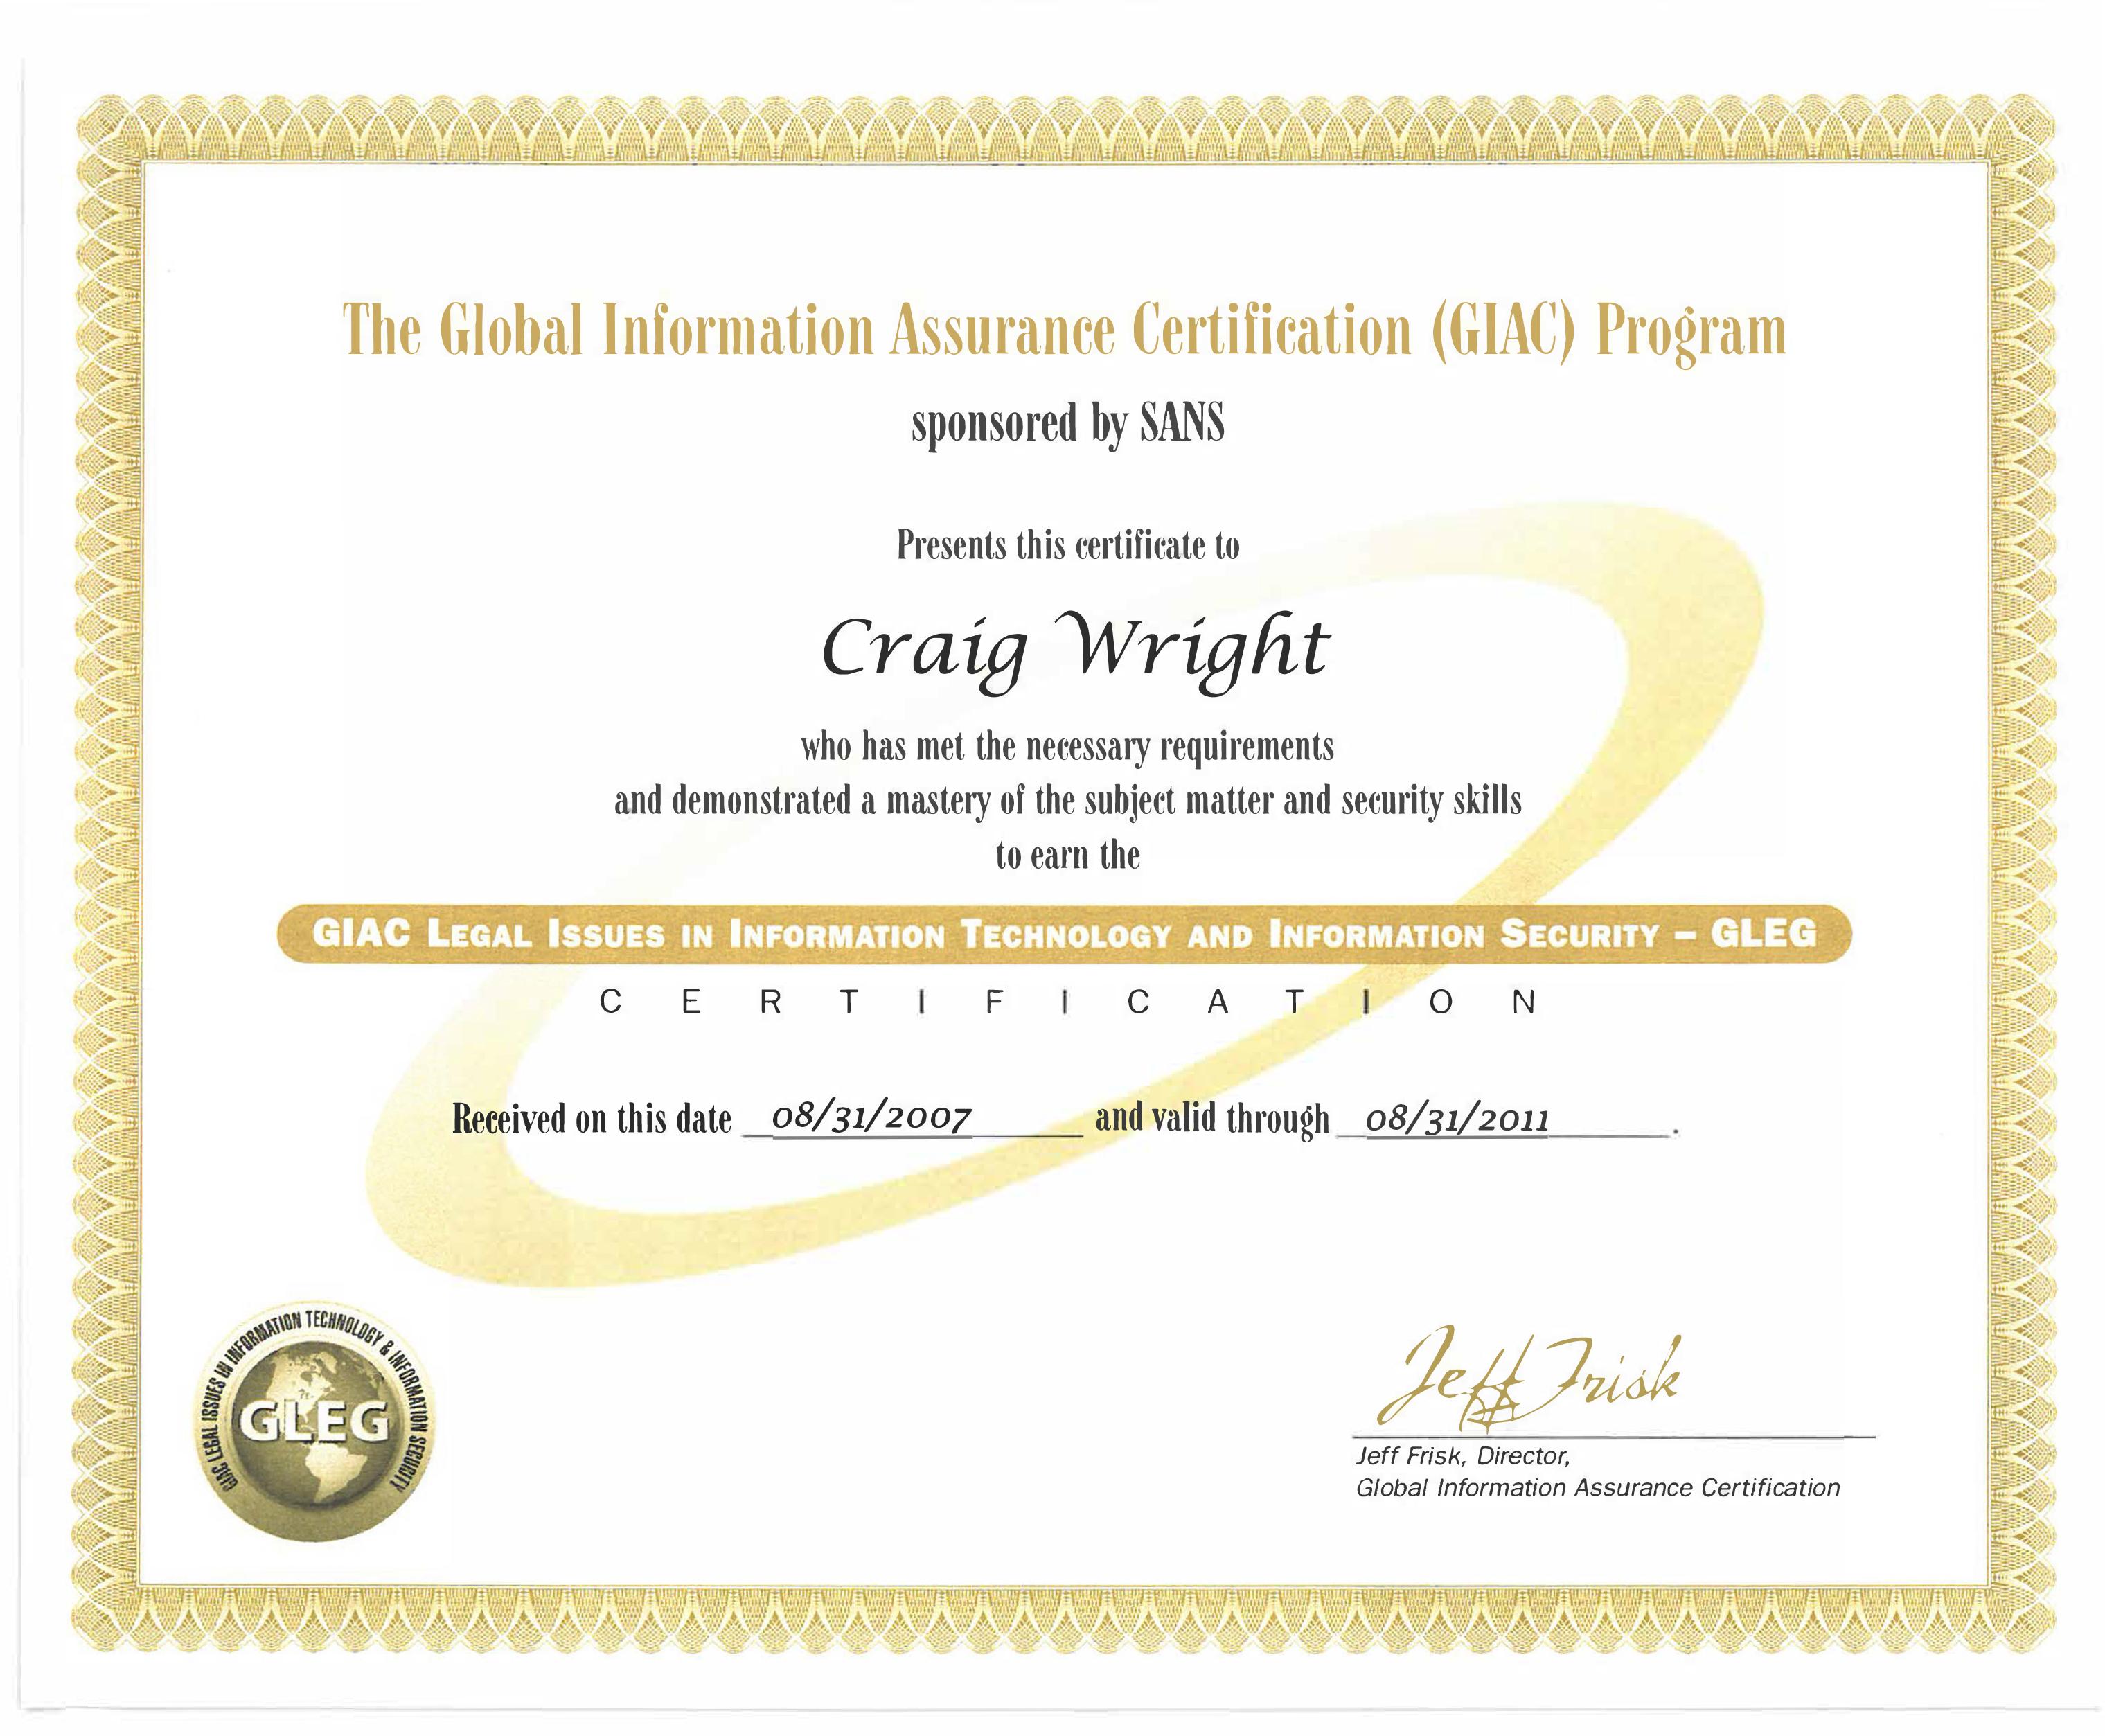 Craig Wright - About Craig